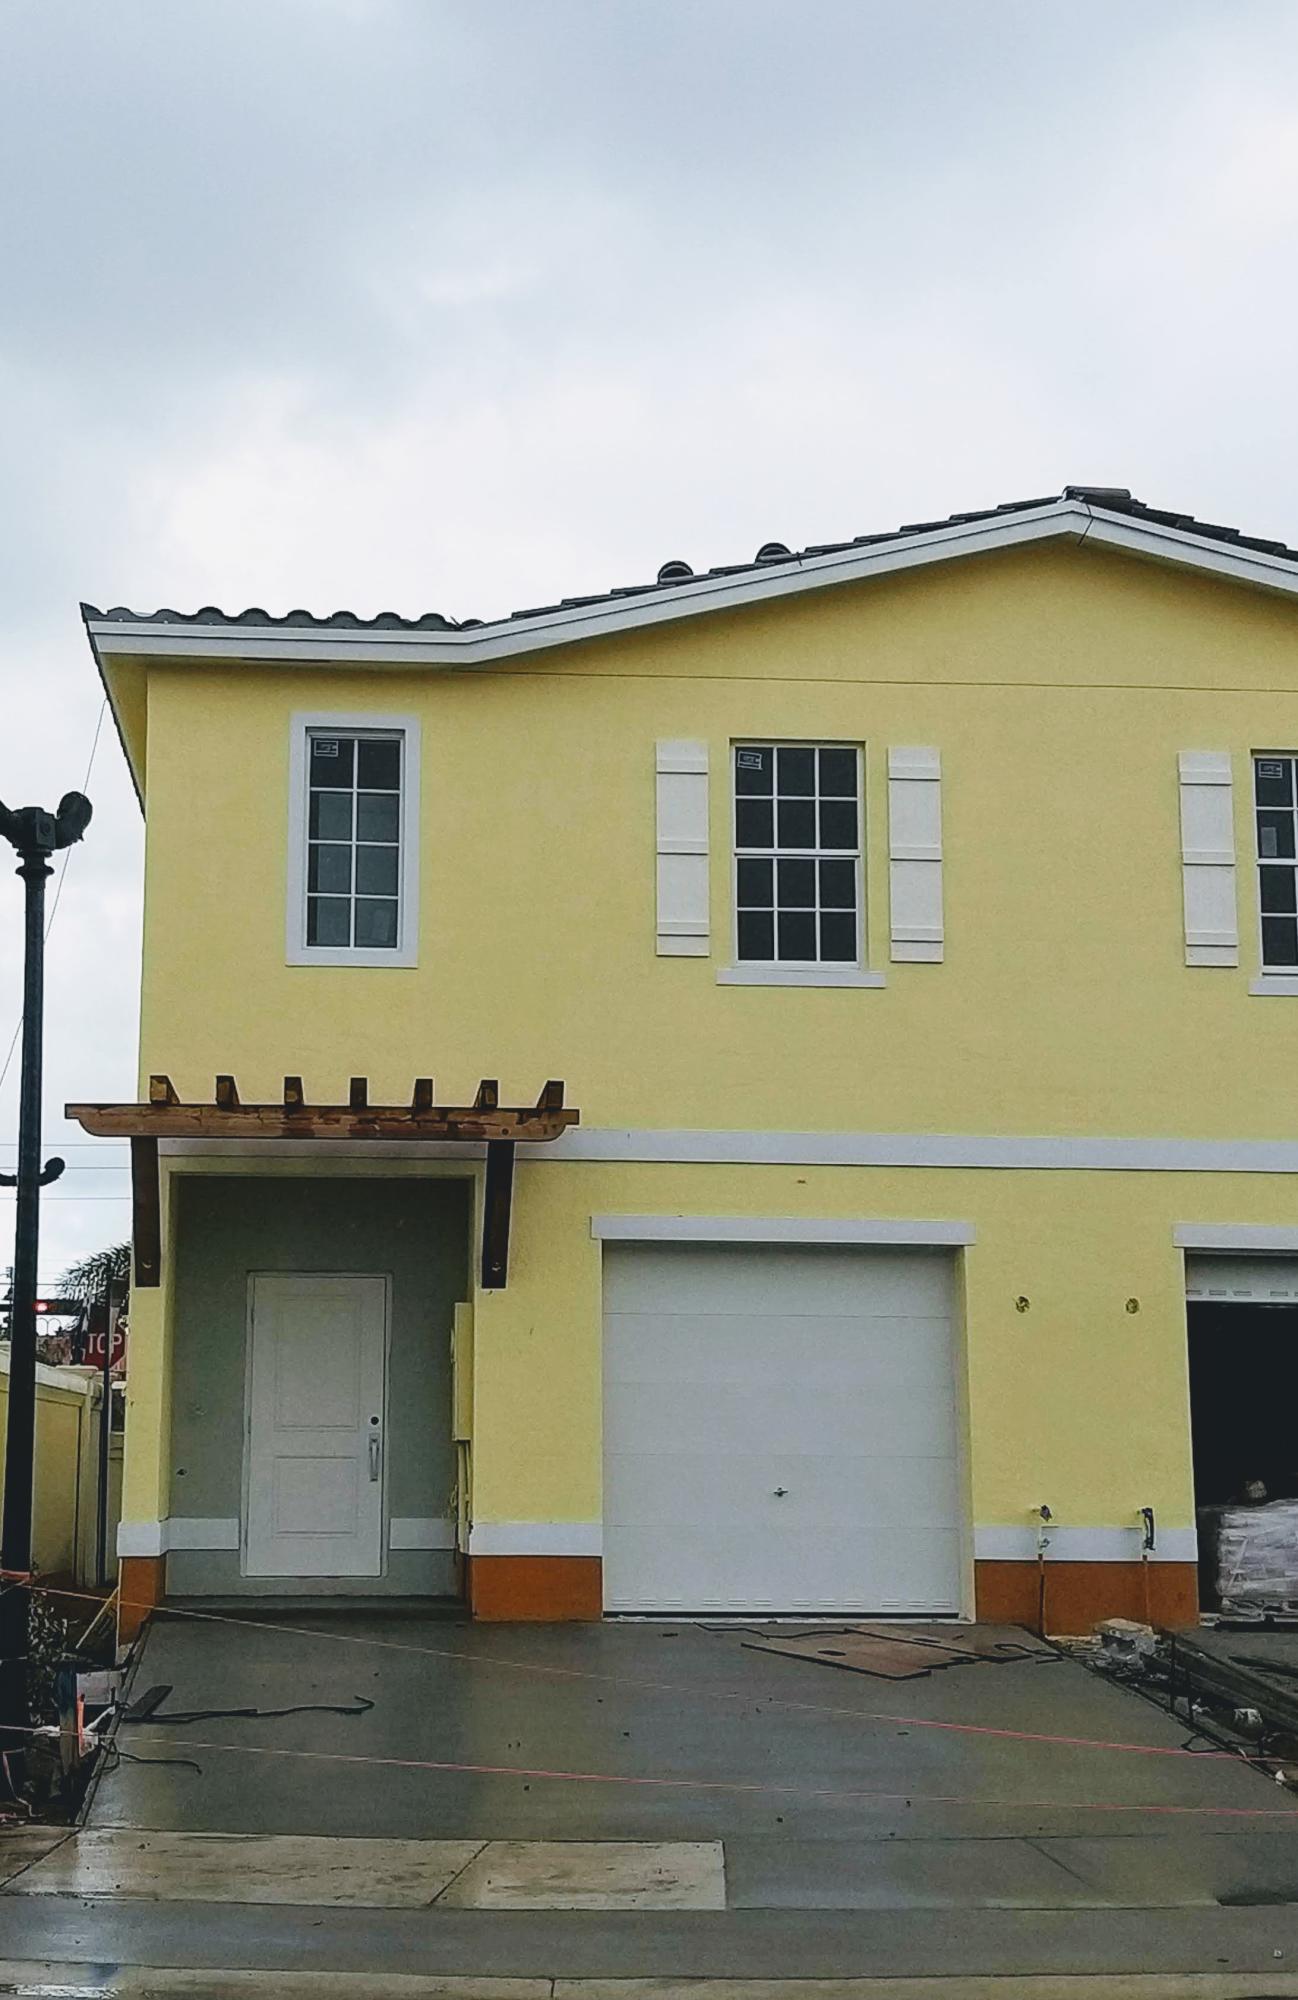 Photo of 1110 NW 40th Terrace, Lauderhill, FL 33313